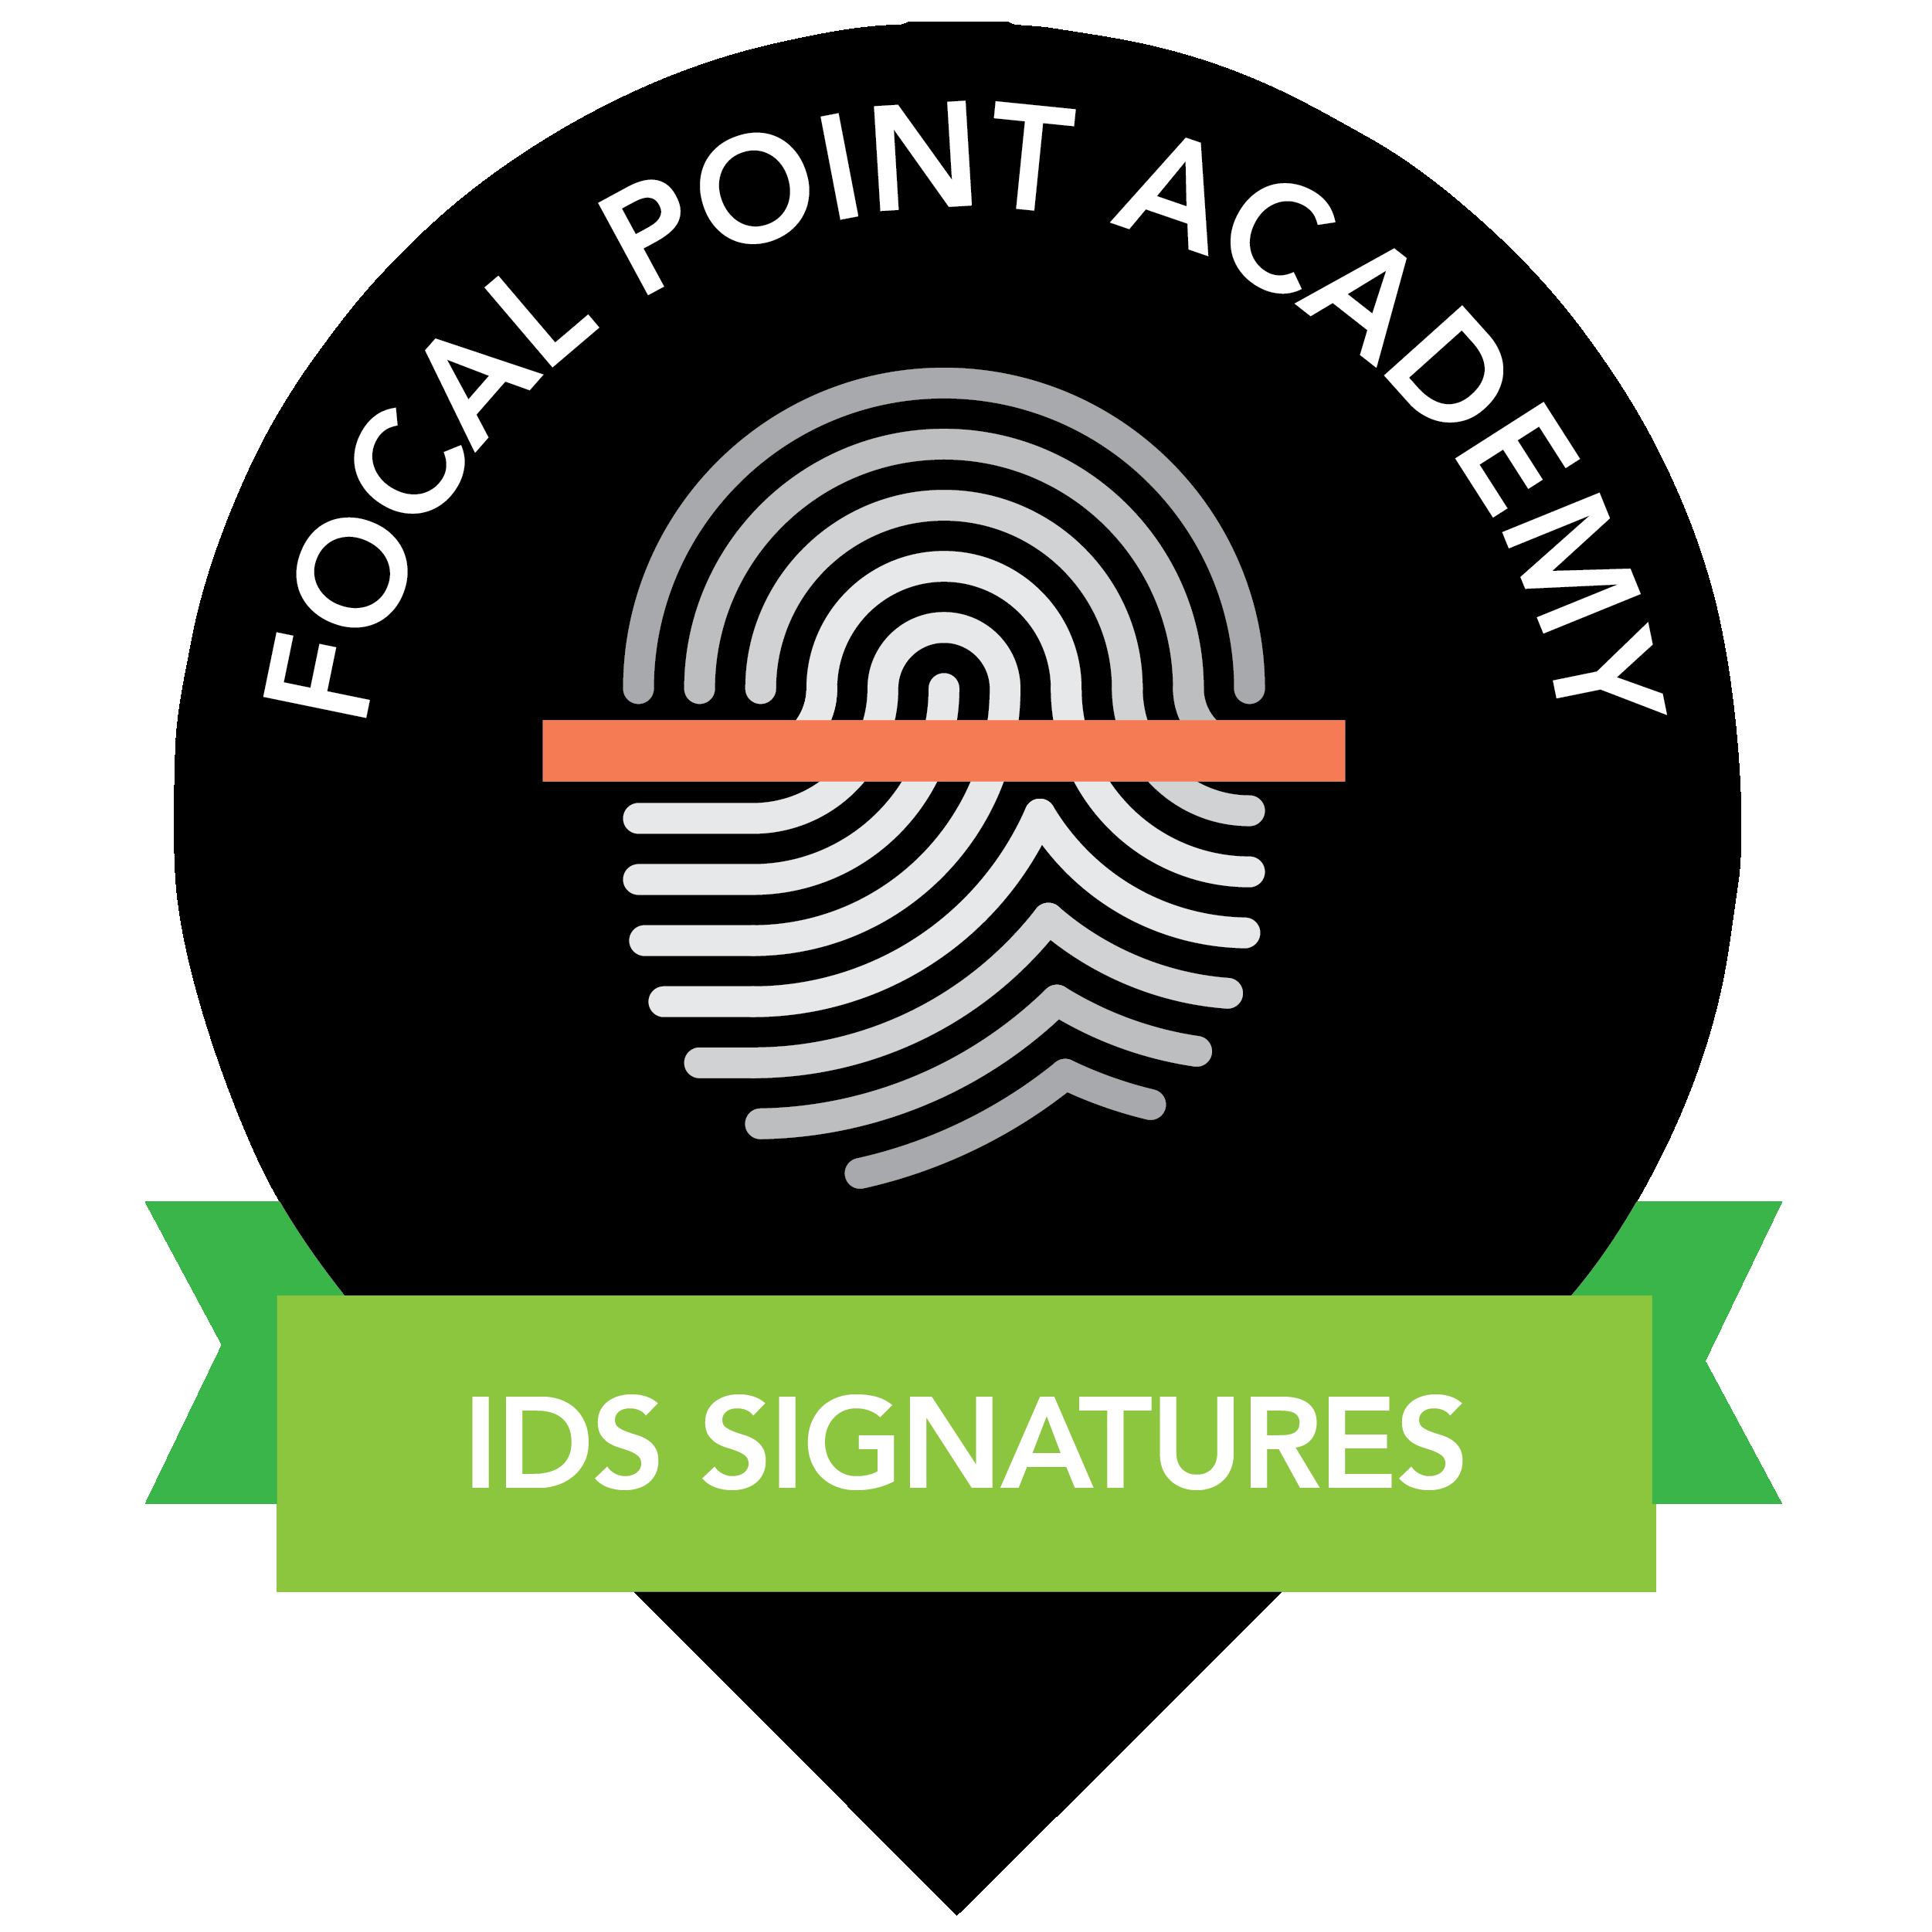 IDS Signature Creation and Optimization